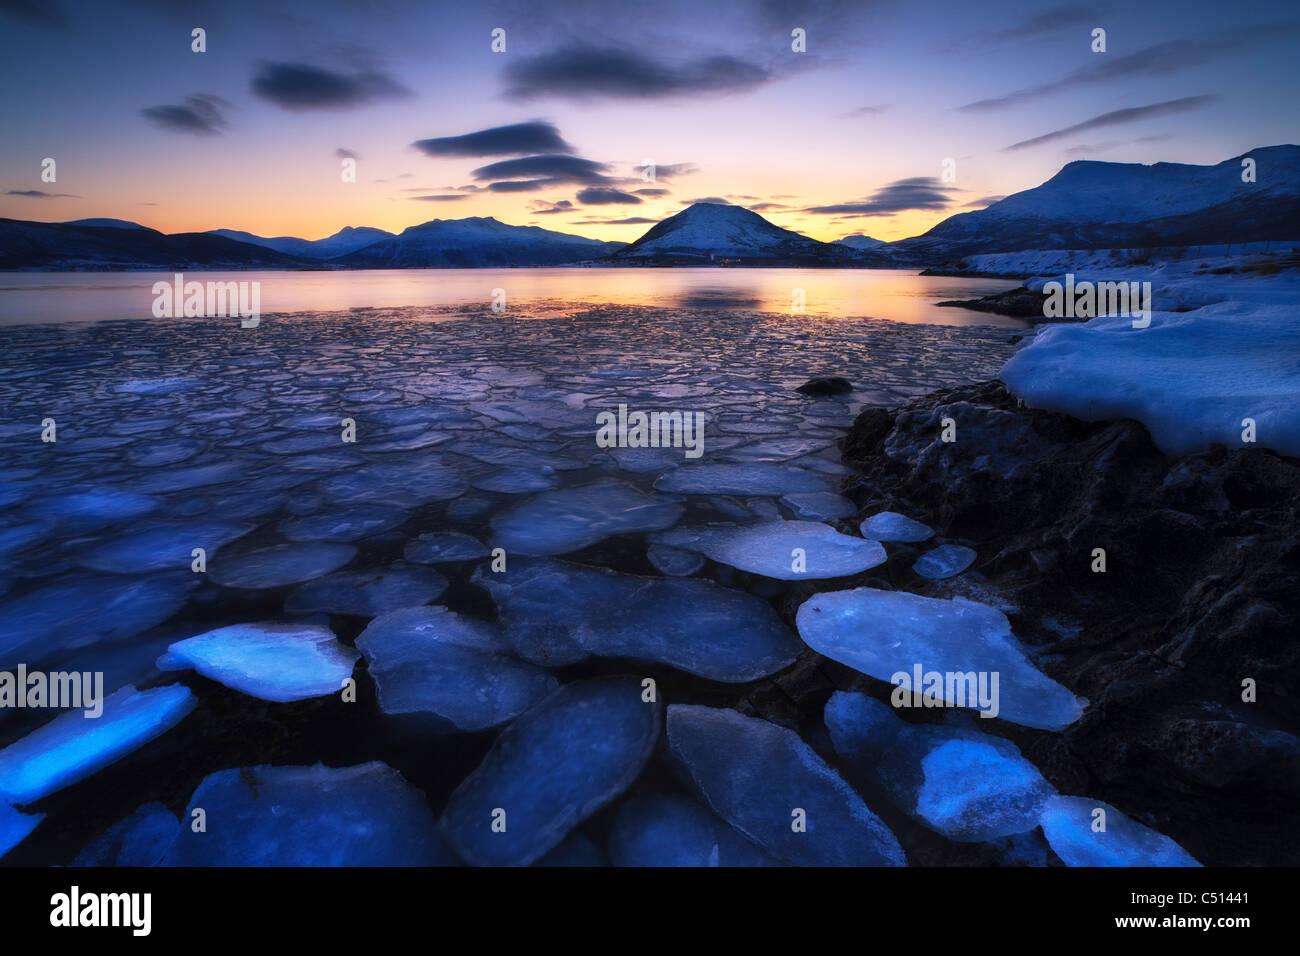 Ice flakes drifting against the sunset in Tjeldsundet strait, Troms County, Norway. - Stock Image